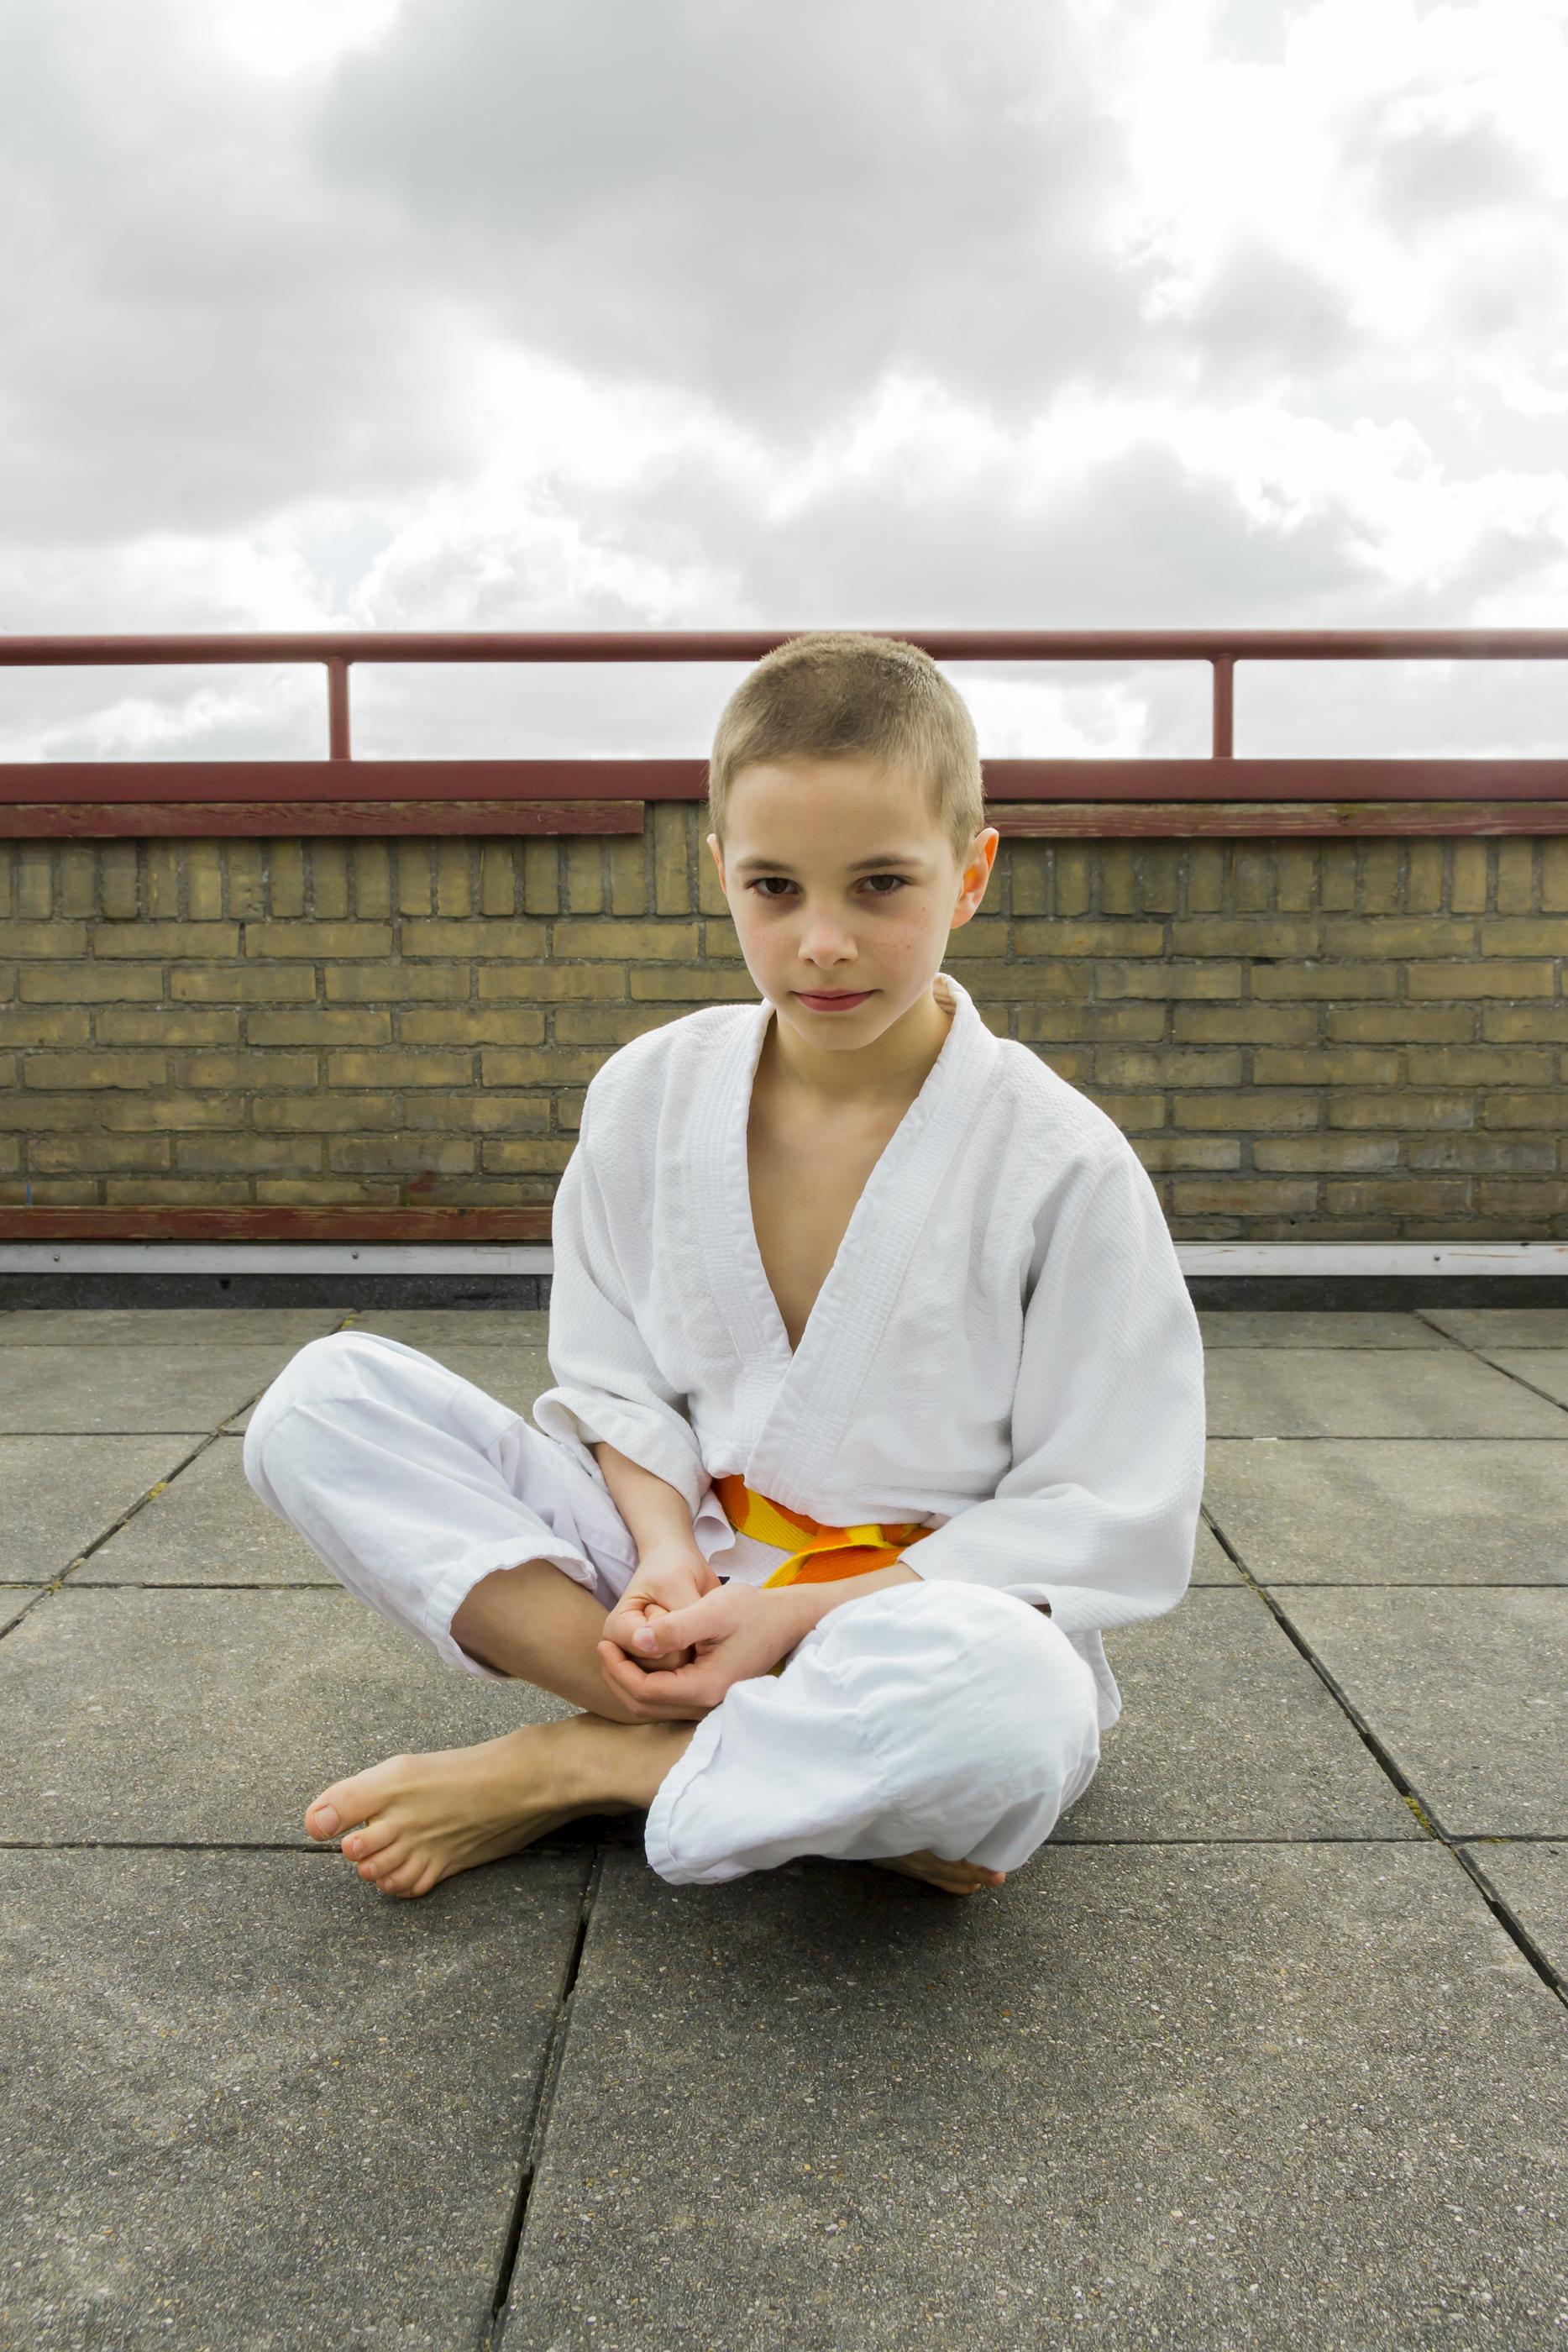 Judoka Teen Boy Sitting On The Roof (sky Background)